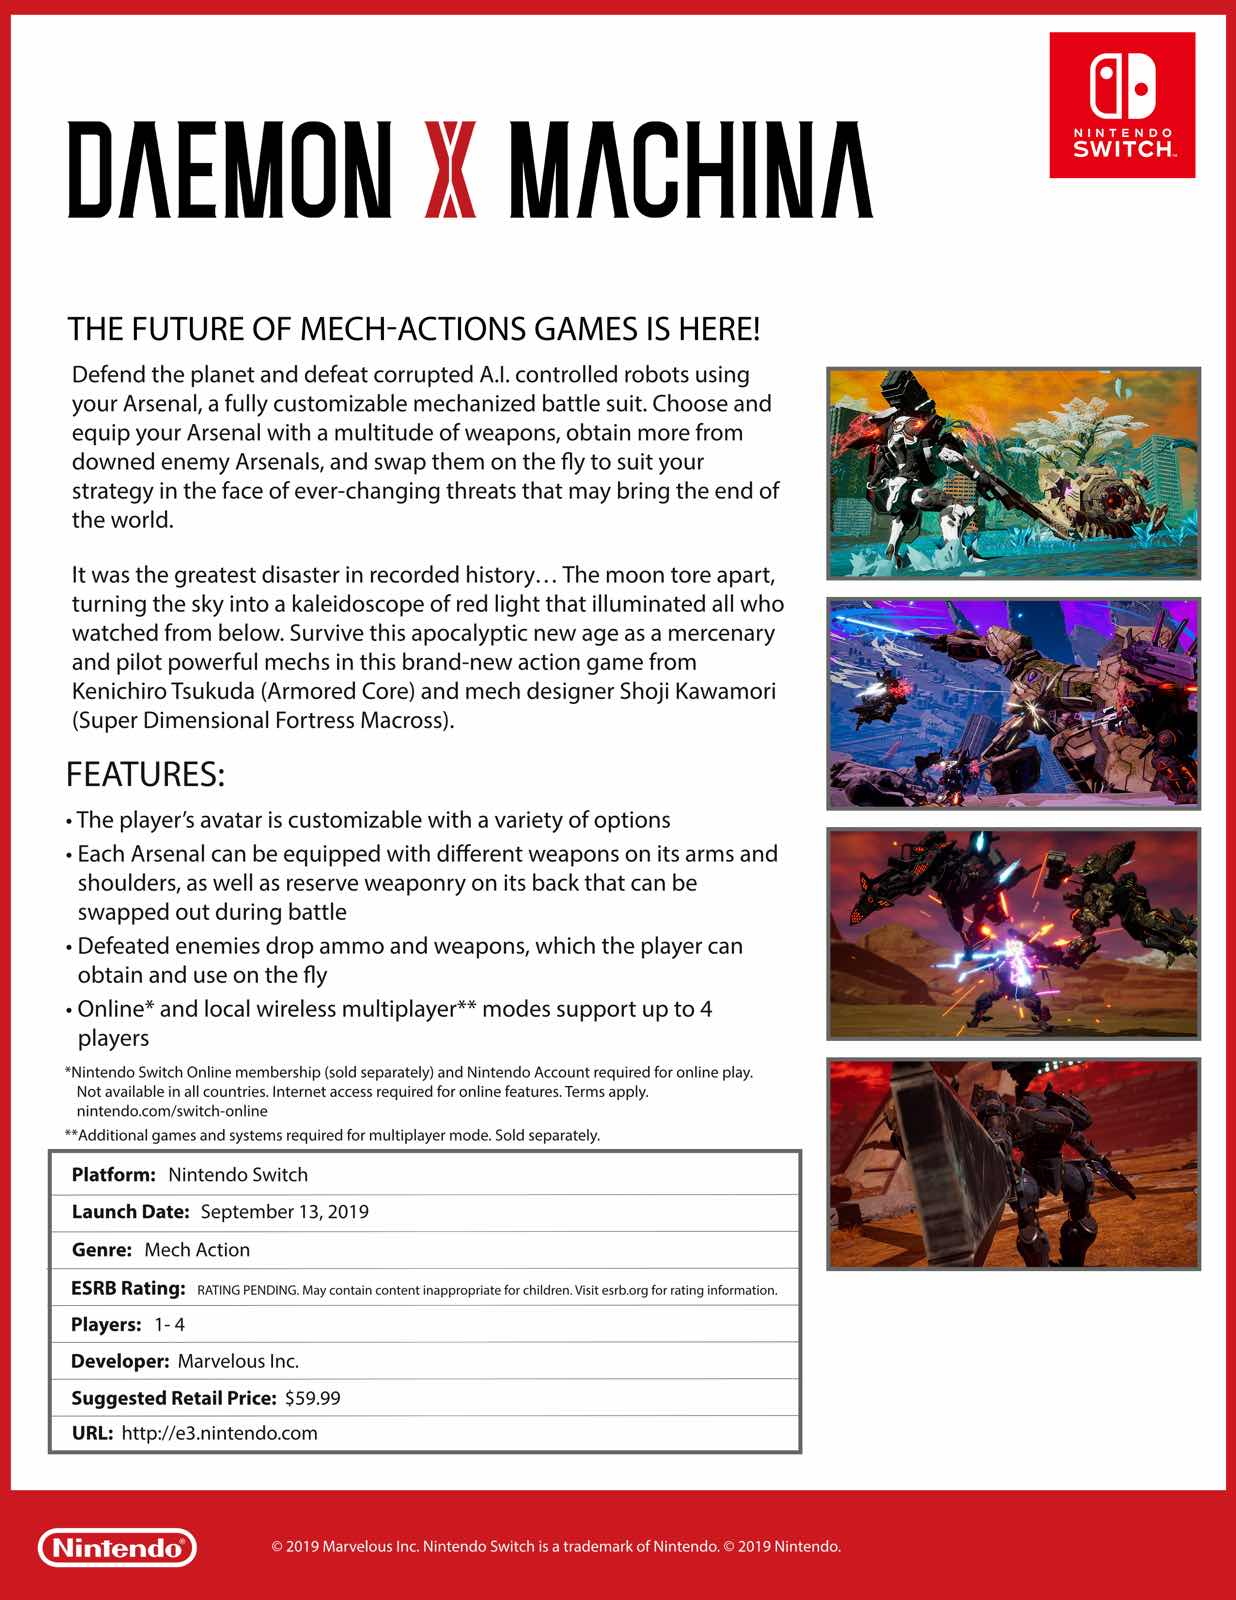 DaemonXMachina-Fact-Sheet